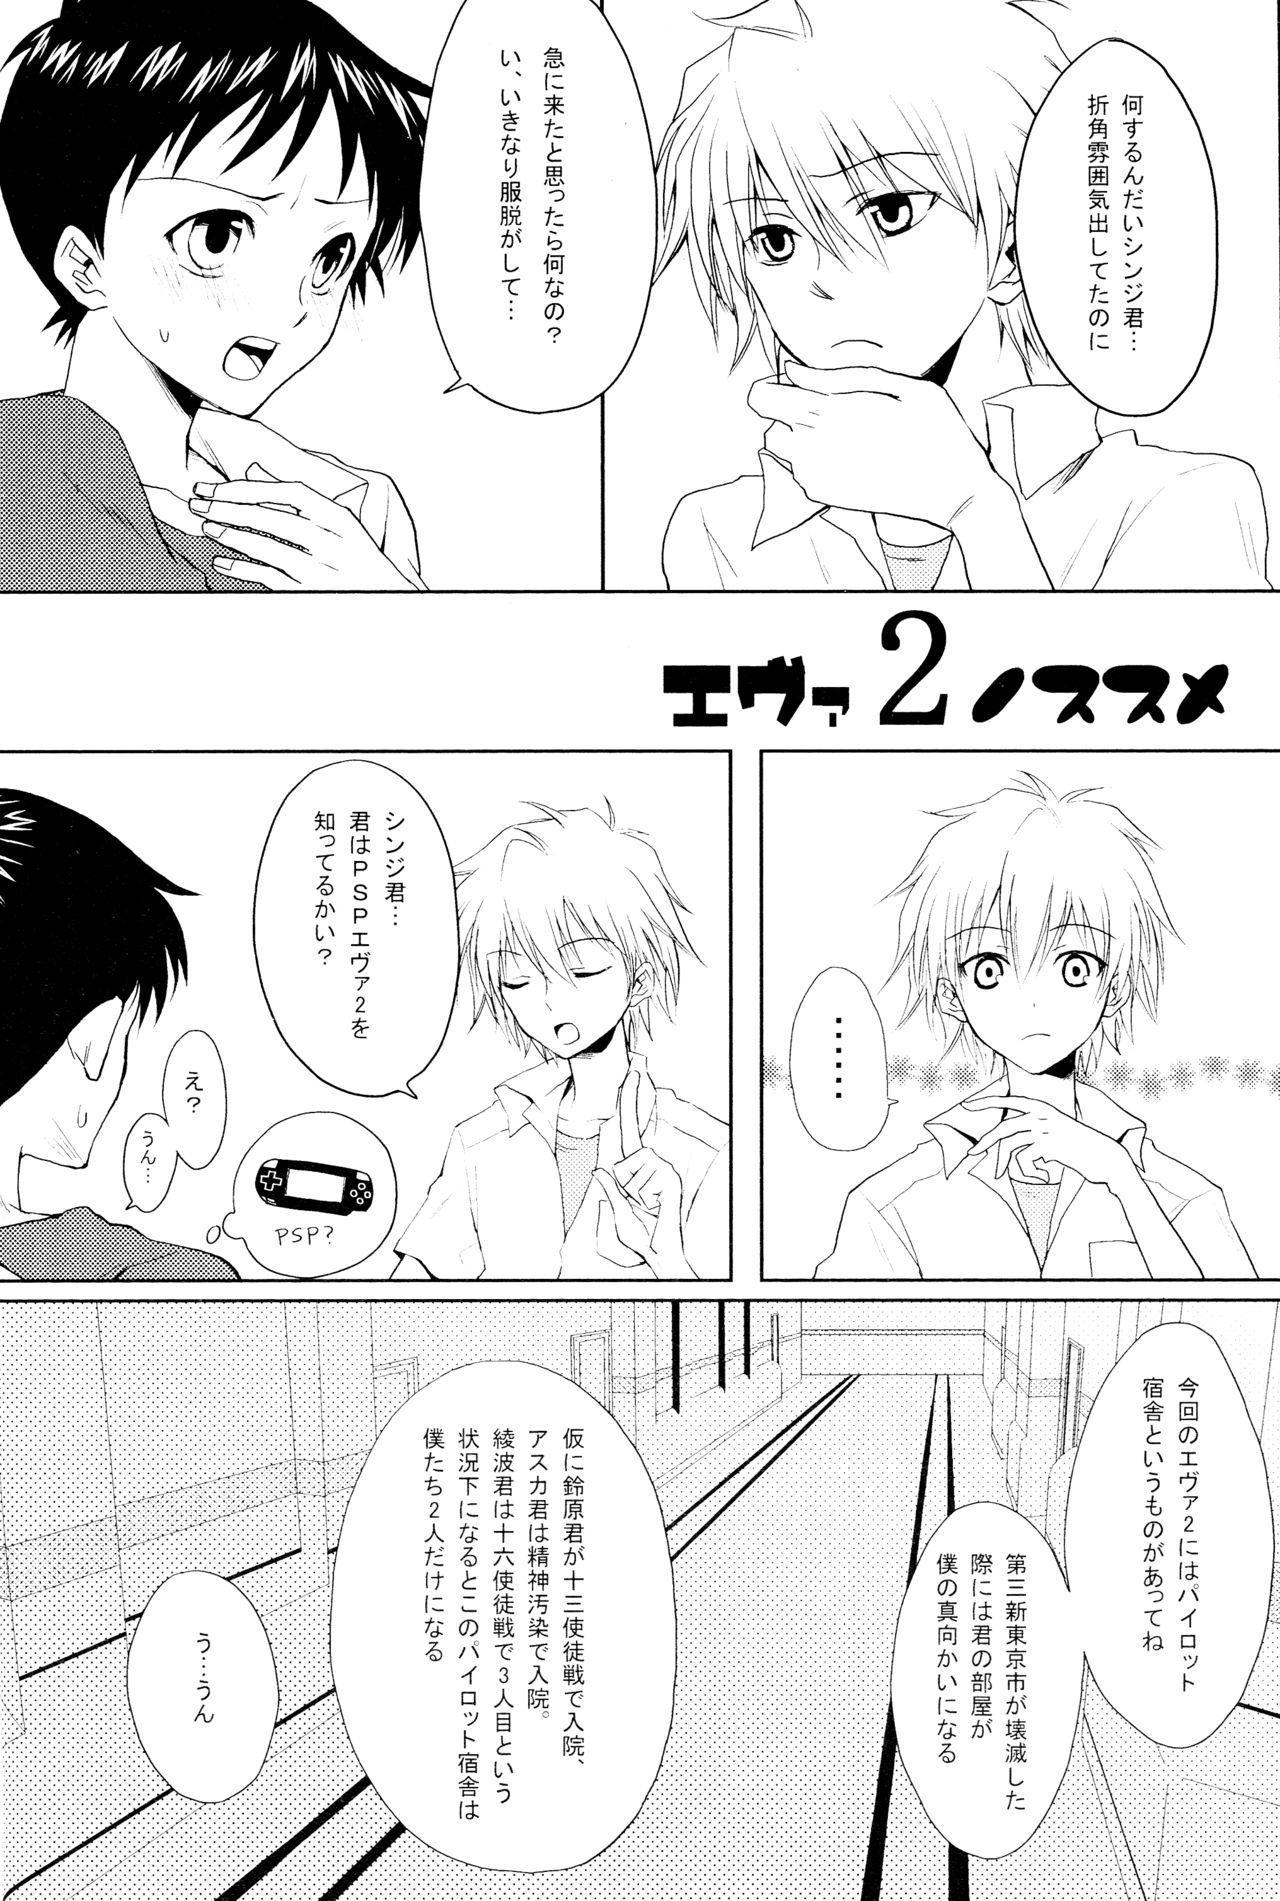 PSP Eva 2 no Susume 4